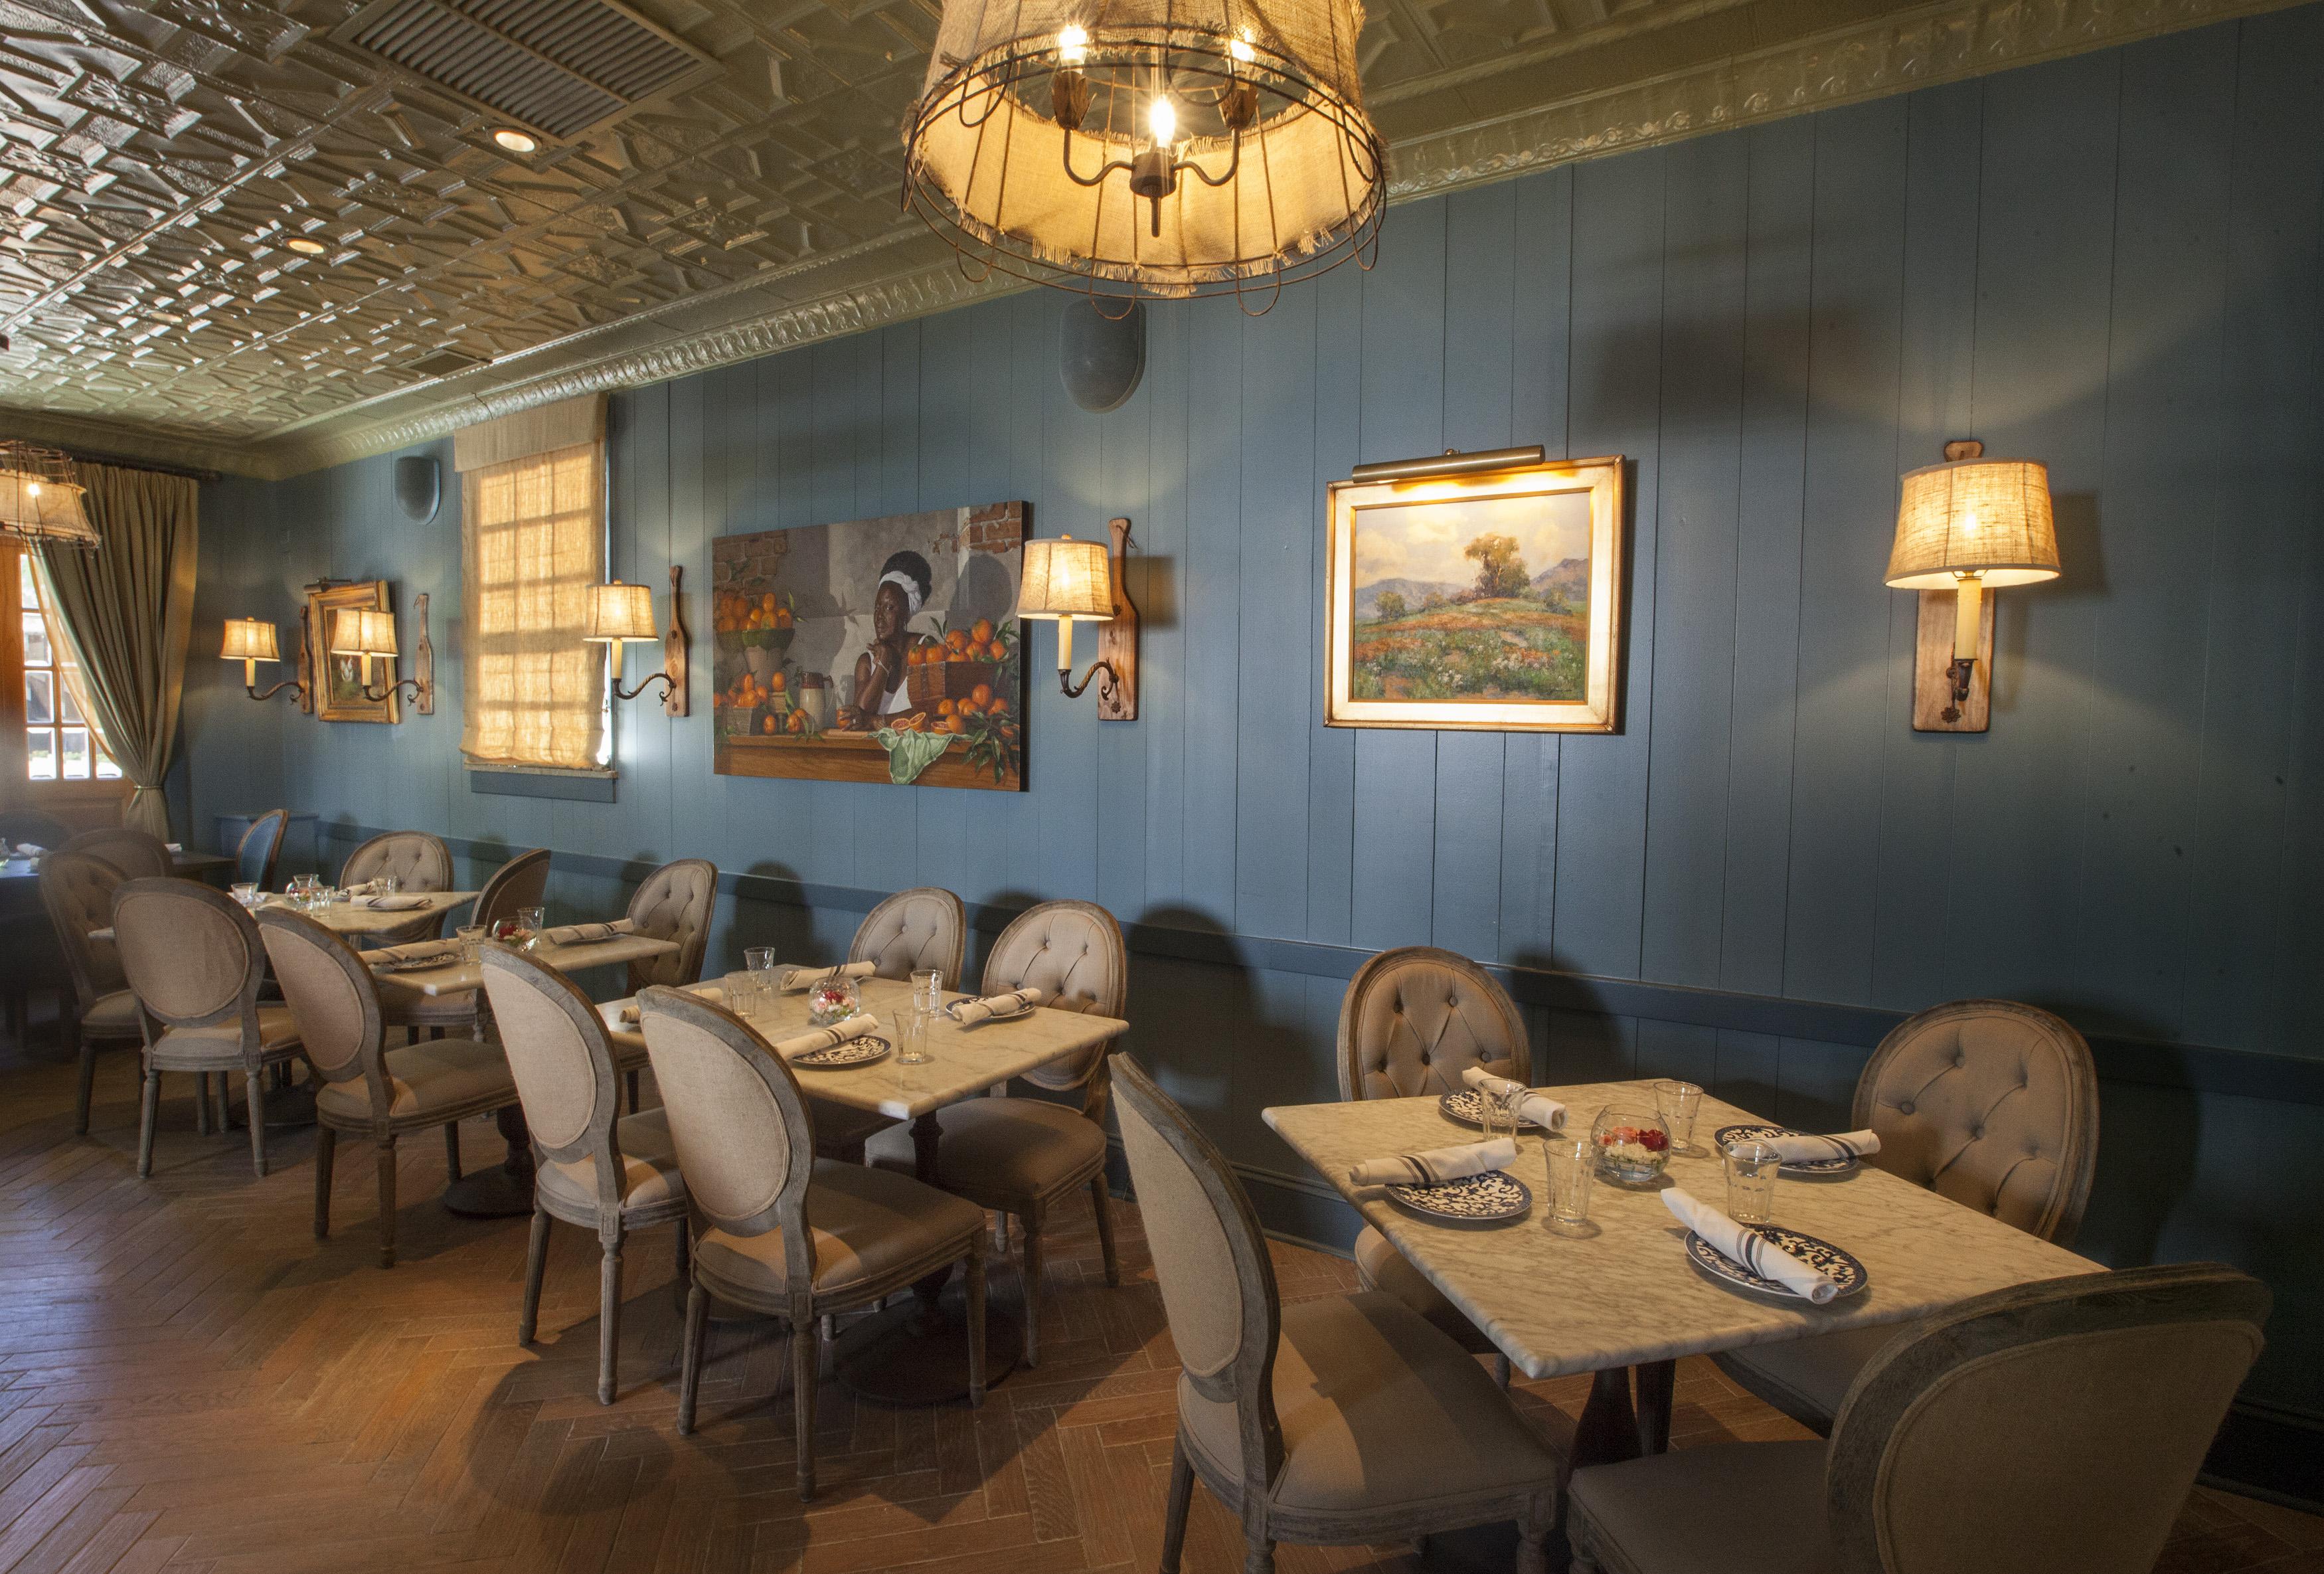 Tour Art Smith S Blue Door Kitchen His Revamped Gold